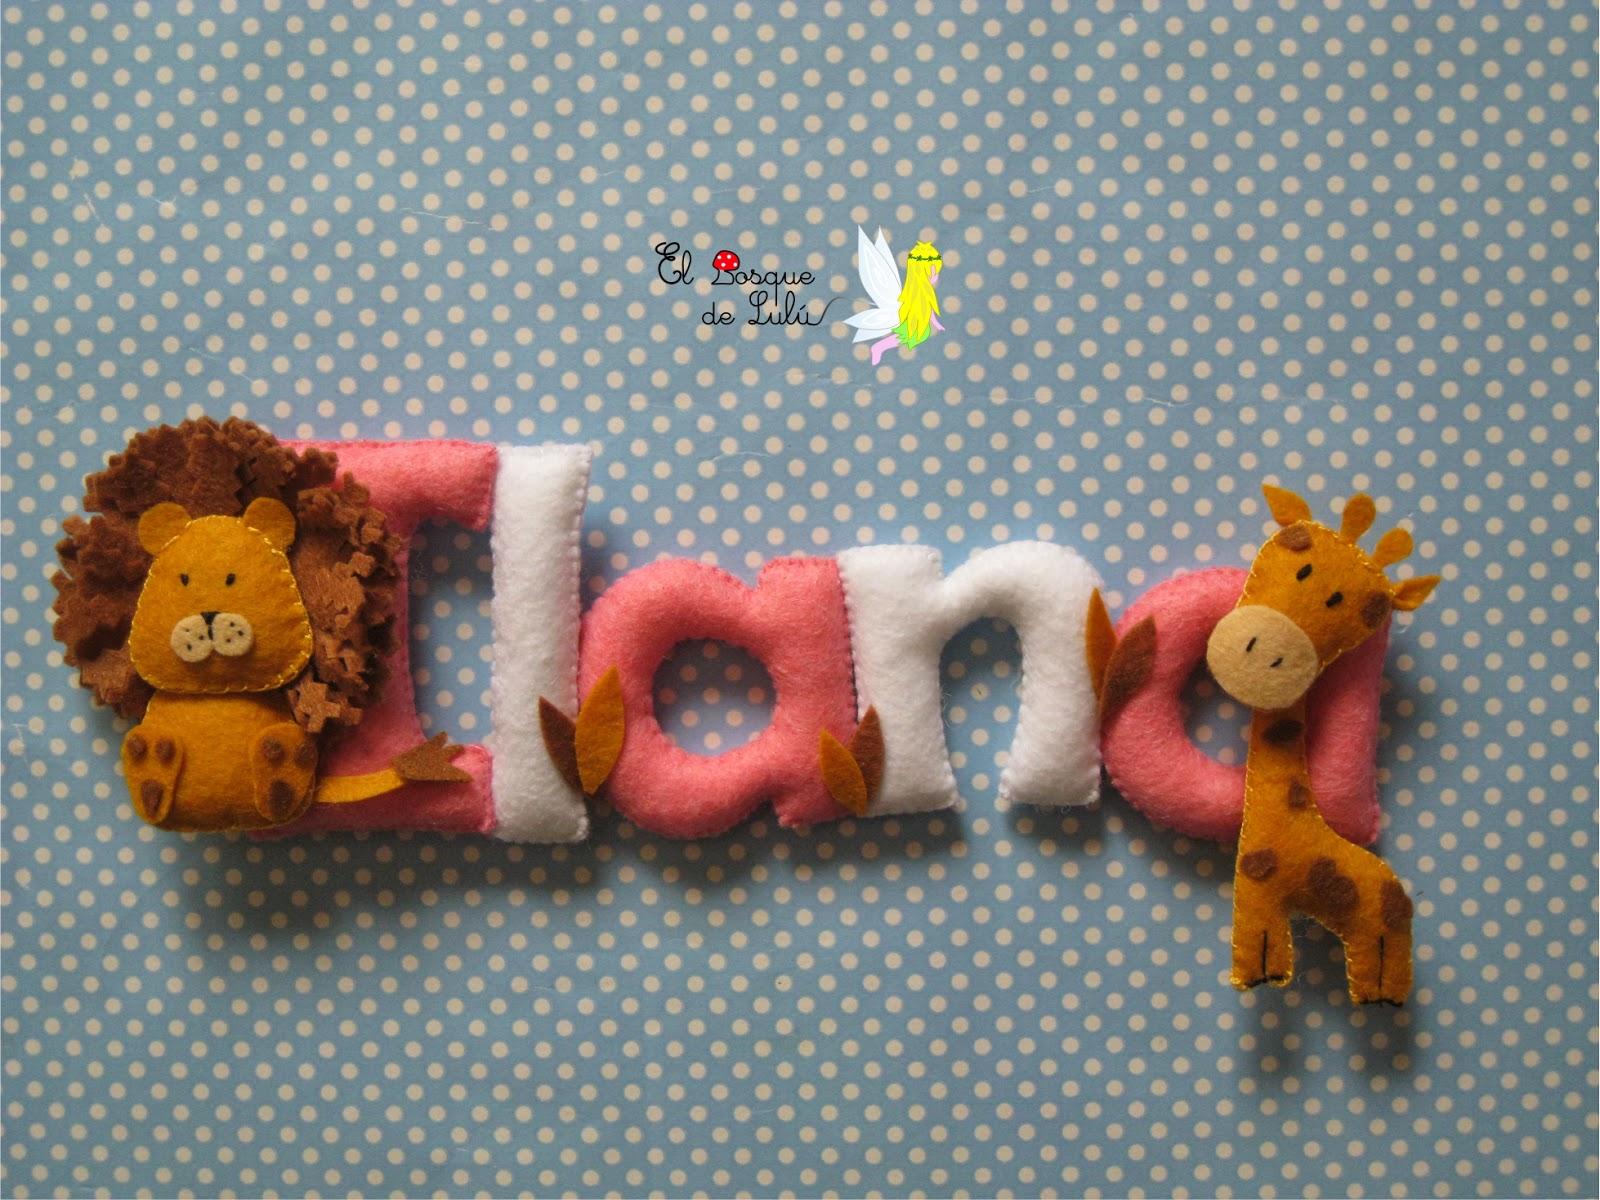 nombre-decorativo-fieltro-Ilana-name-banner-infantil-detalle-nacimiento